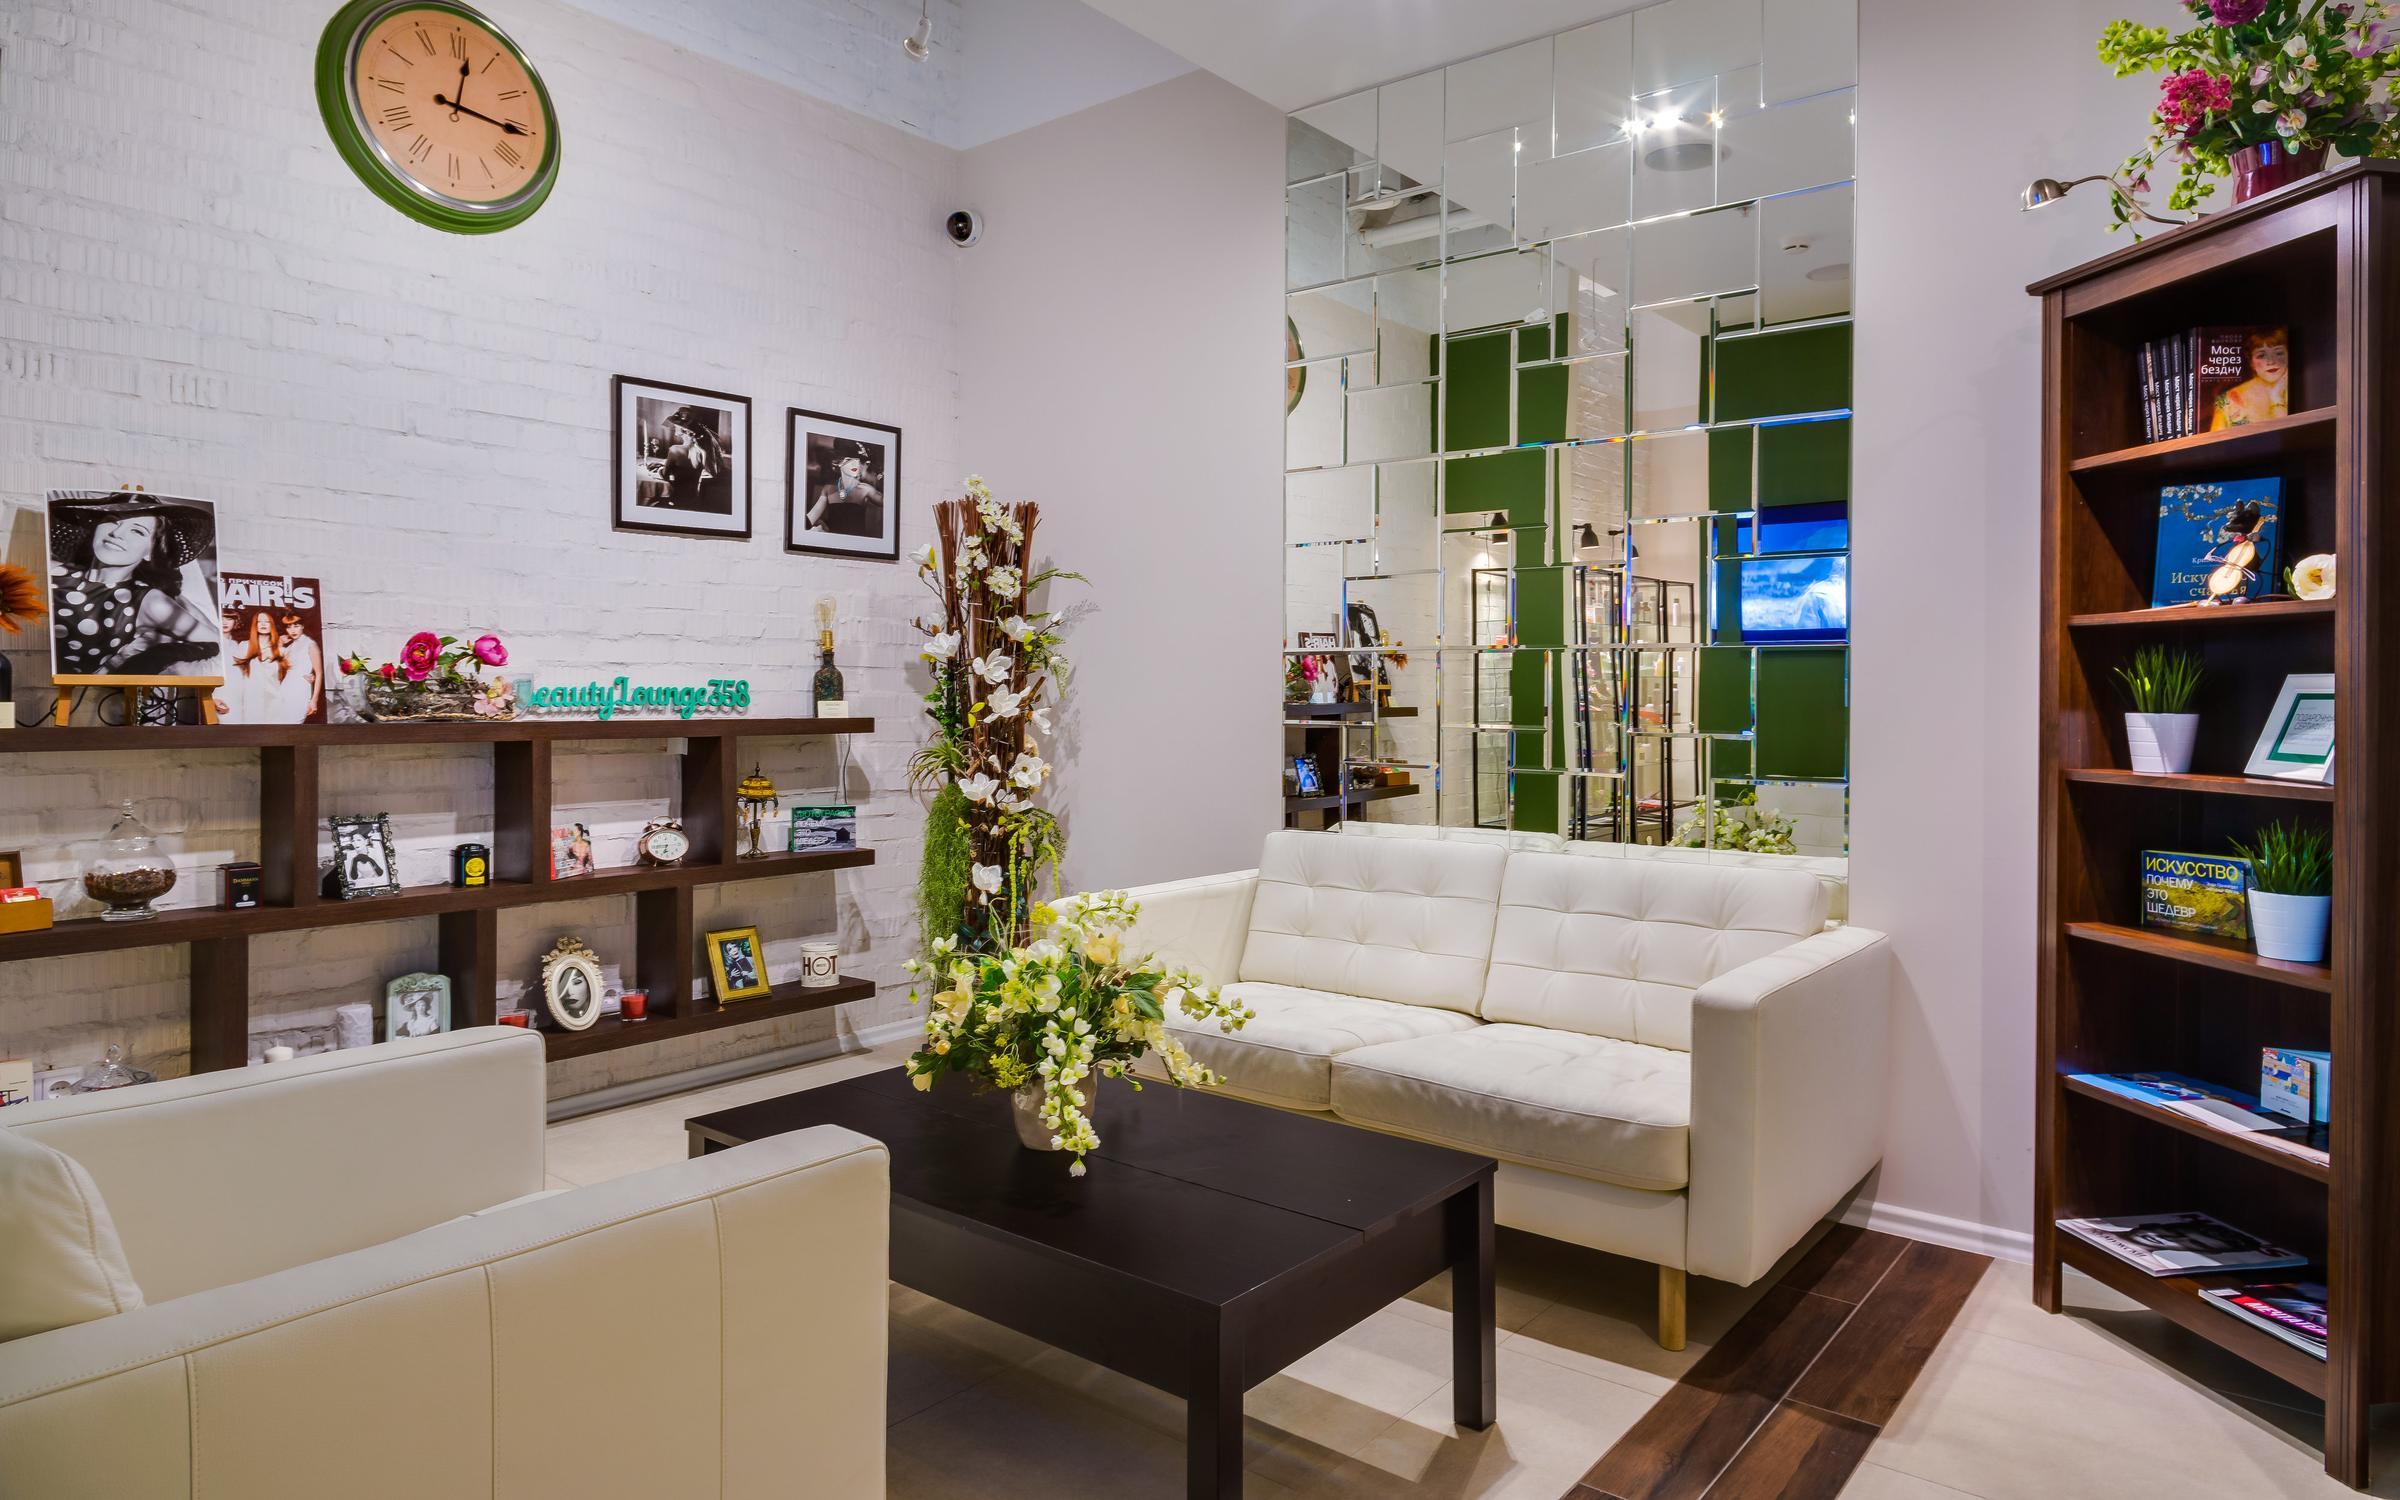 фотография Салона красоты Beauty Lounge 358 на метро Калужская